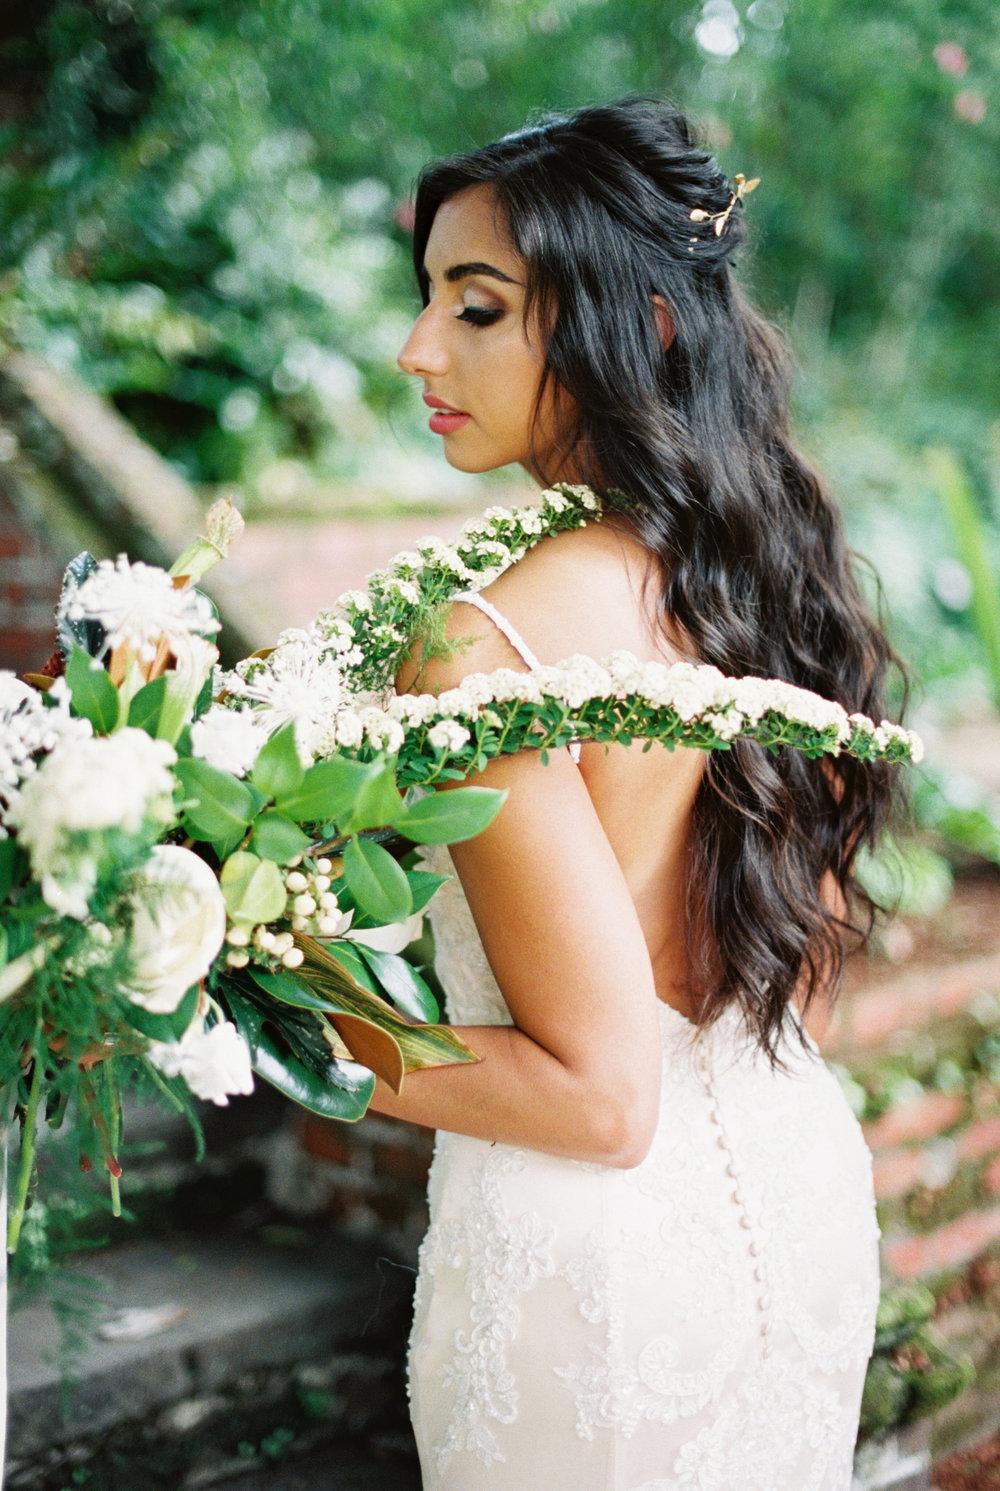 MelissaBlytheNorthCarolinaFineArtFilmWeddingPhotographer-133.jpg